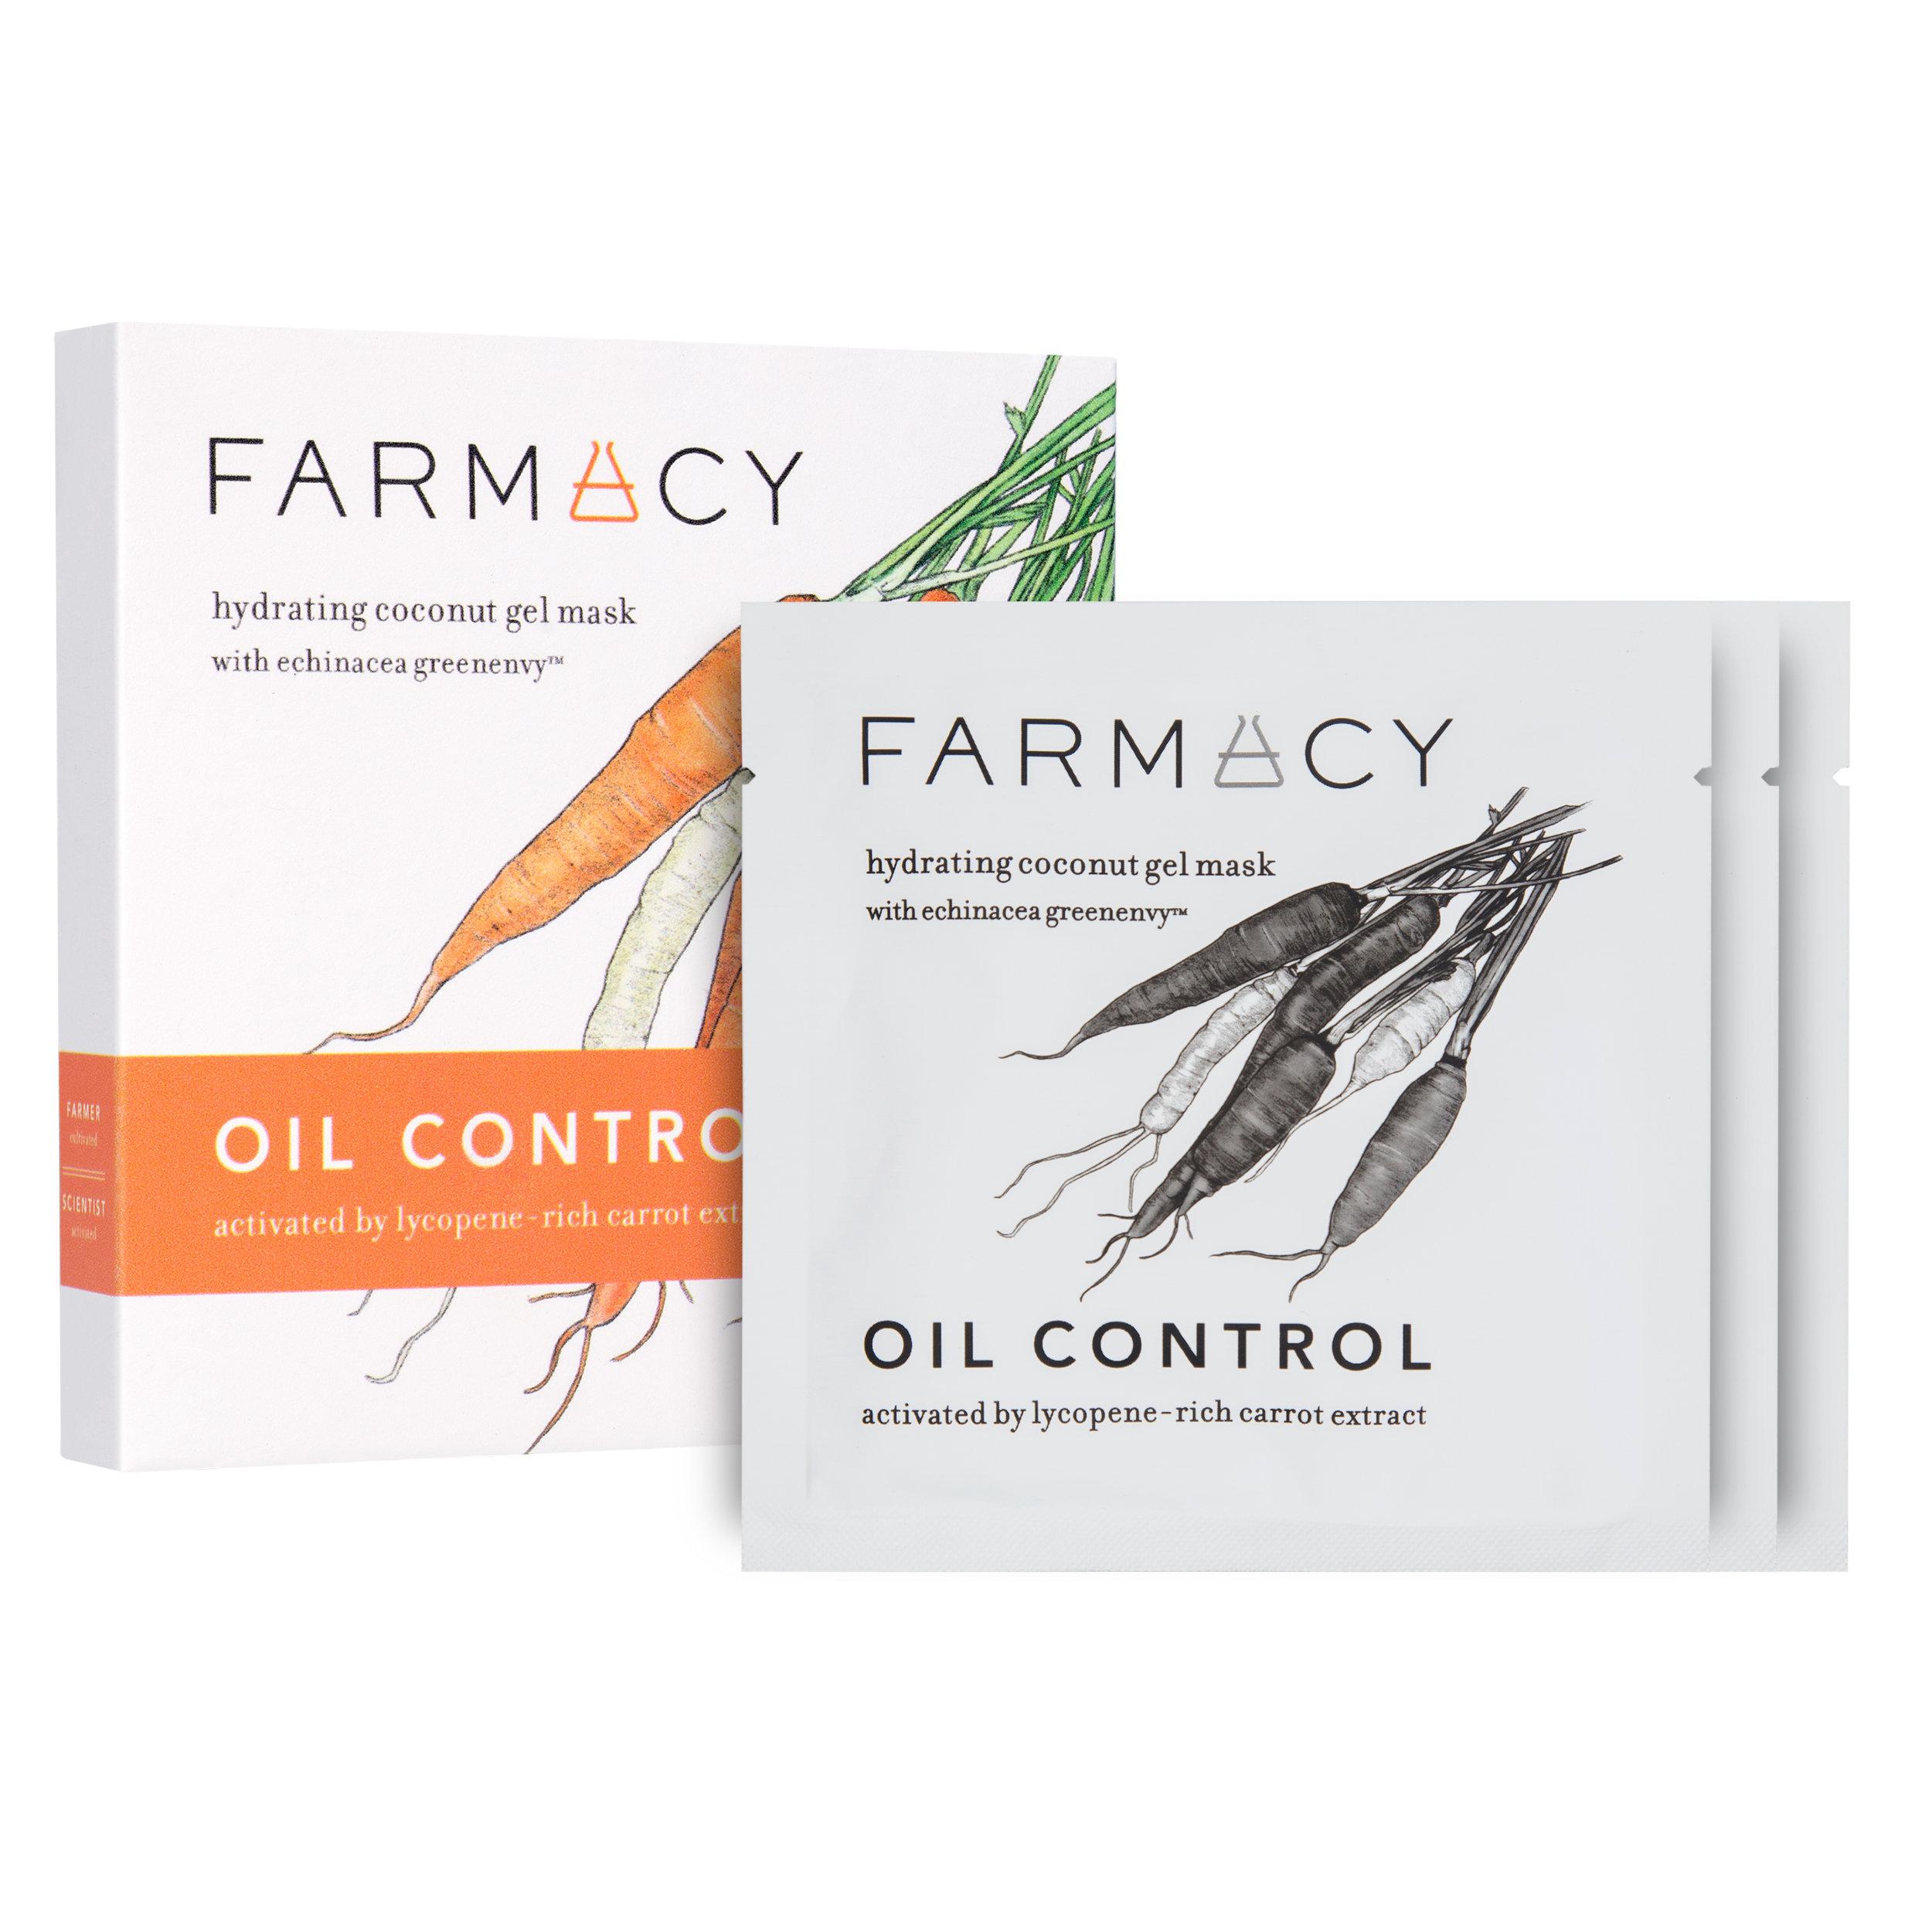 Farmacysachets plus boxes_oil control.jpg